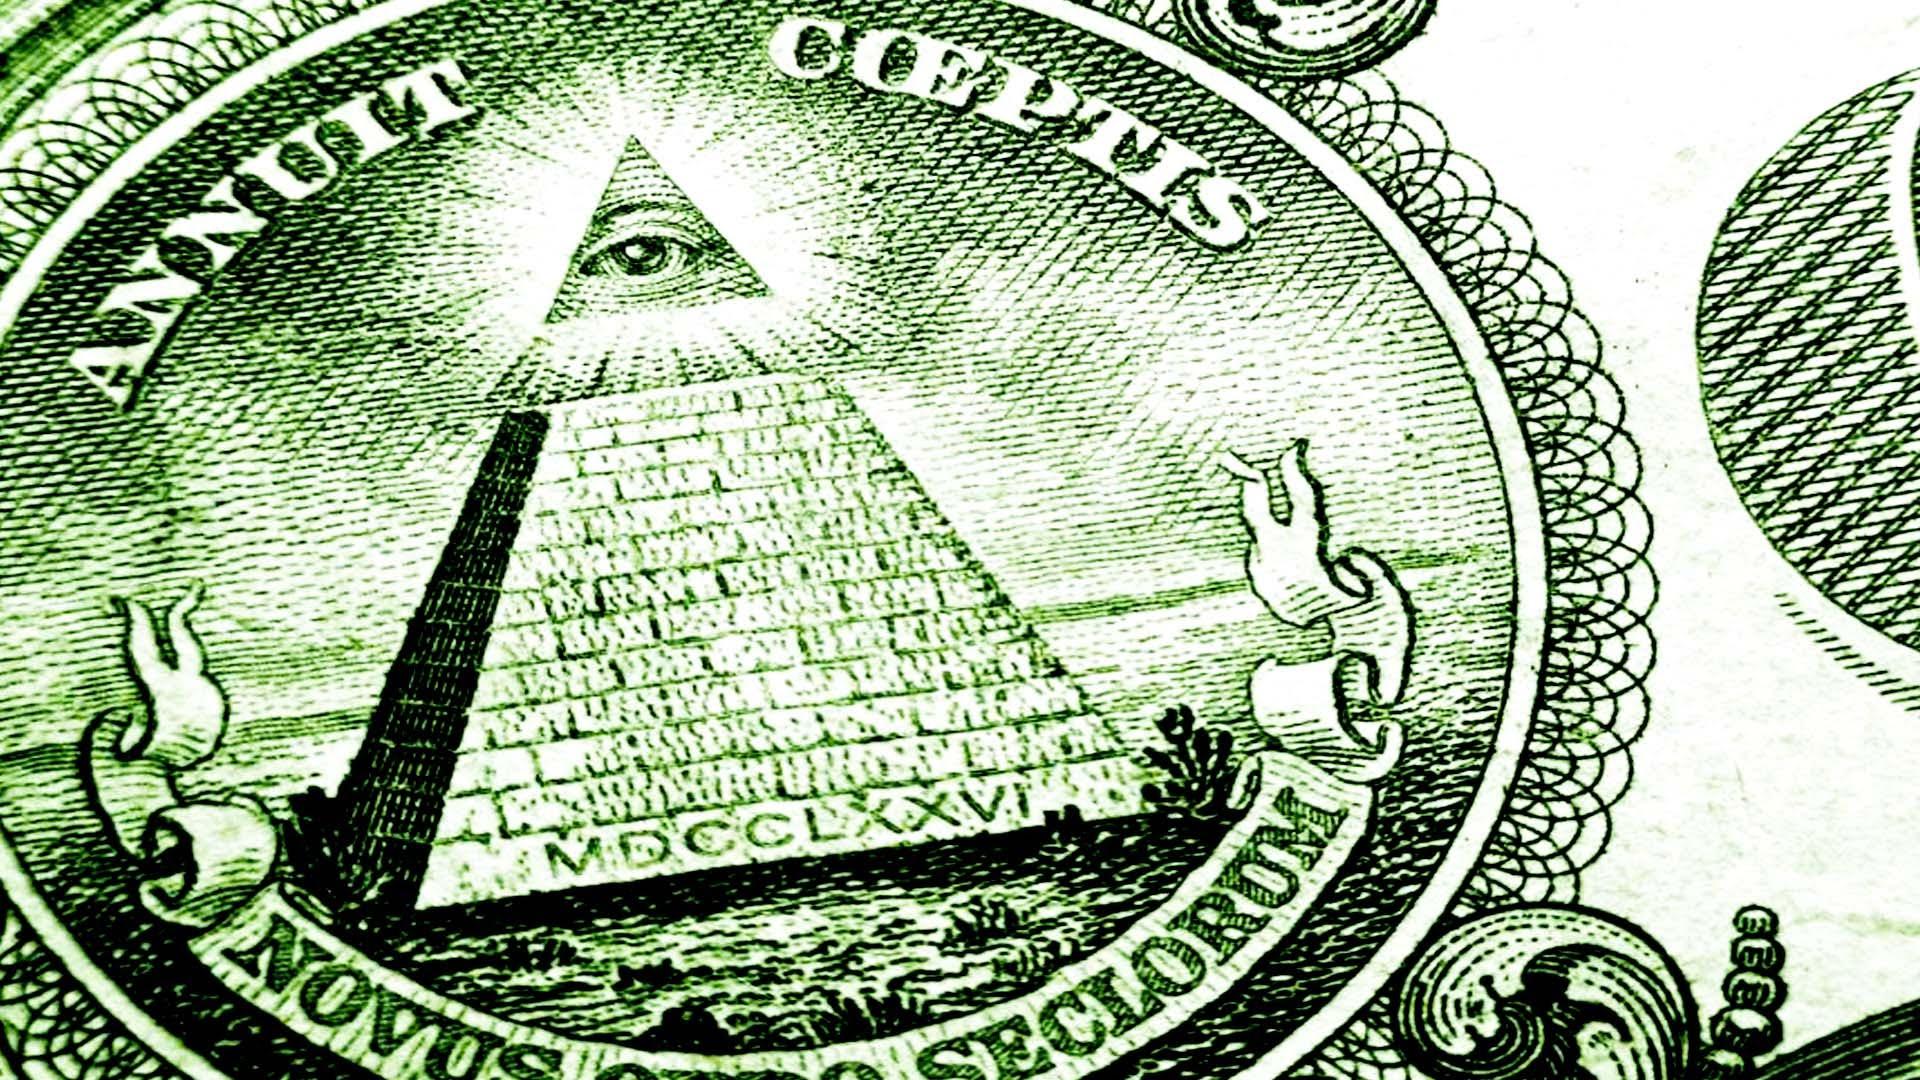 Illuminati High Quality Background on Wallpapers Vista